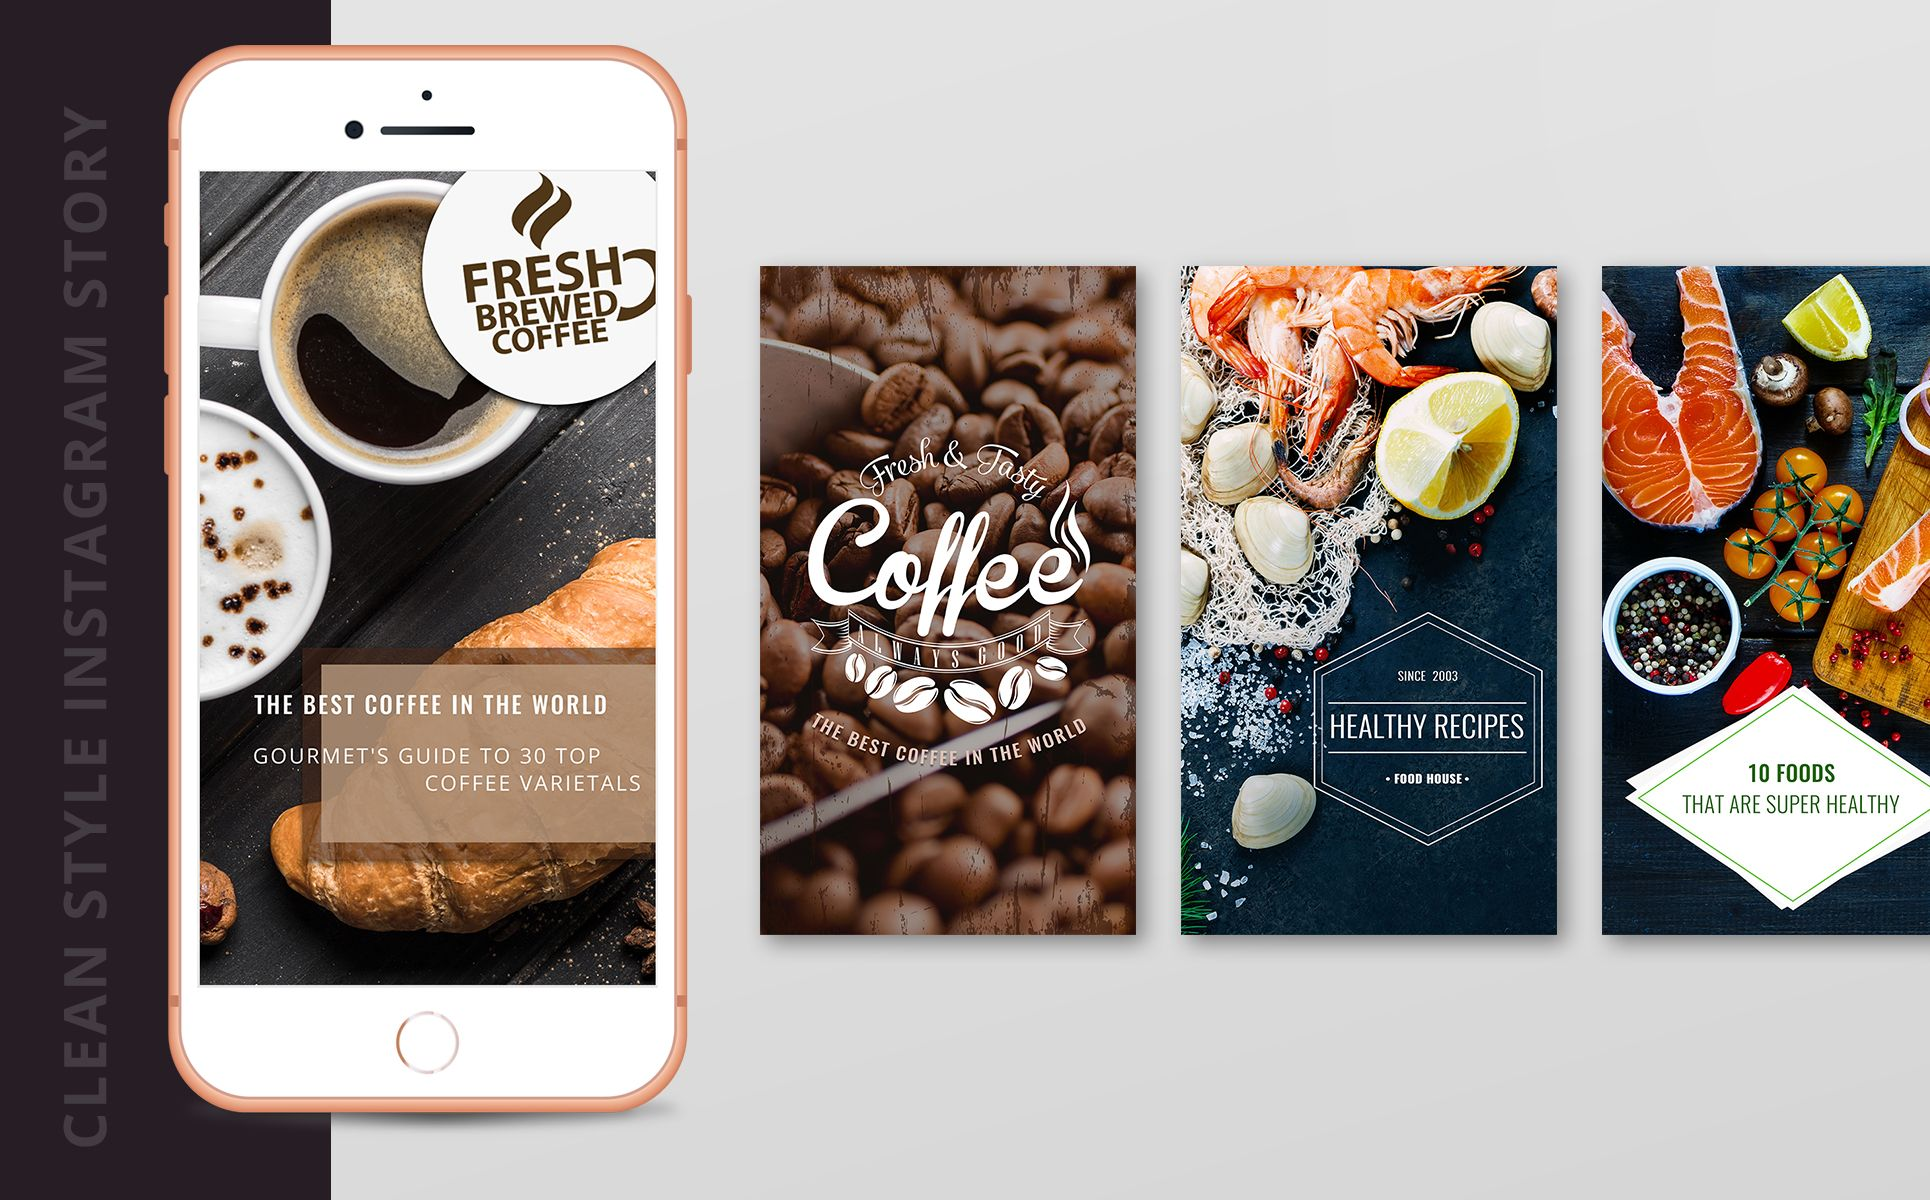 Instagram Widget Wordpress. How to Add Instagram Feed to WordPress with Elementor Page Builder - 2d61b7948d9759eebe1ae1e26d75959f